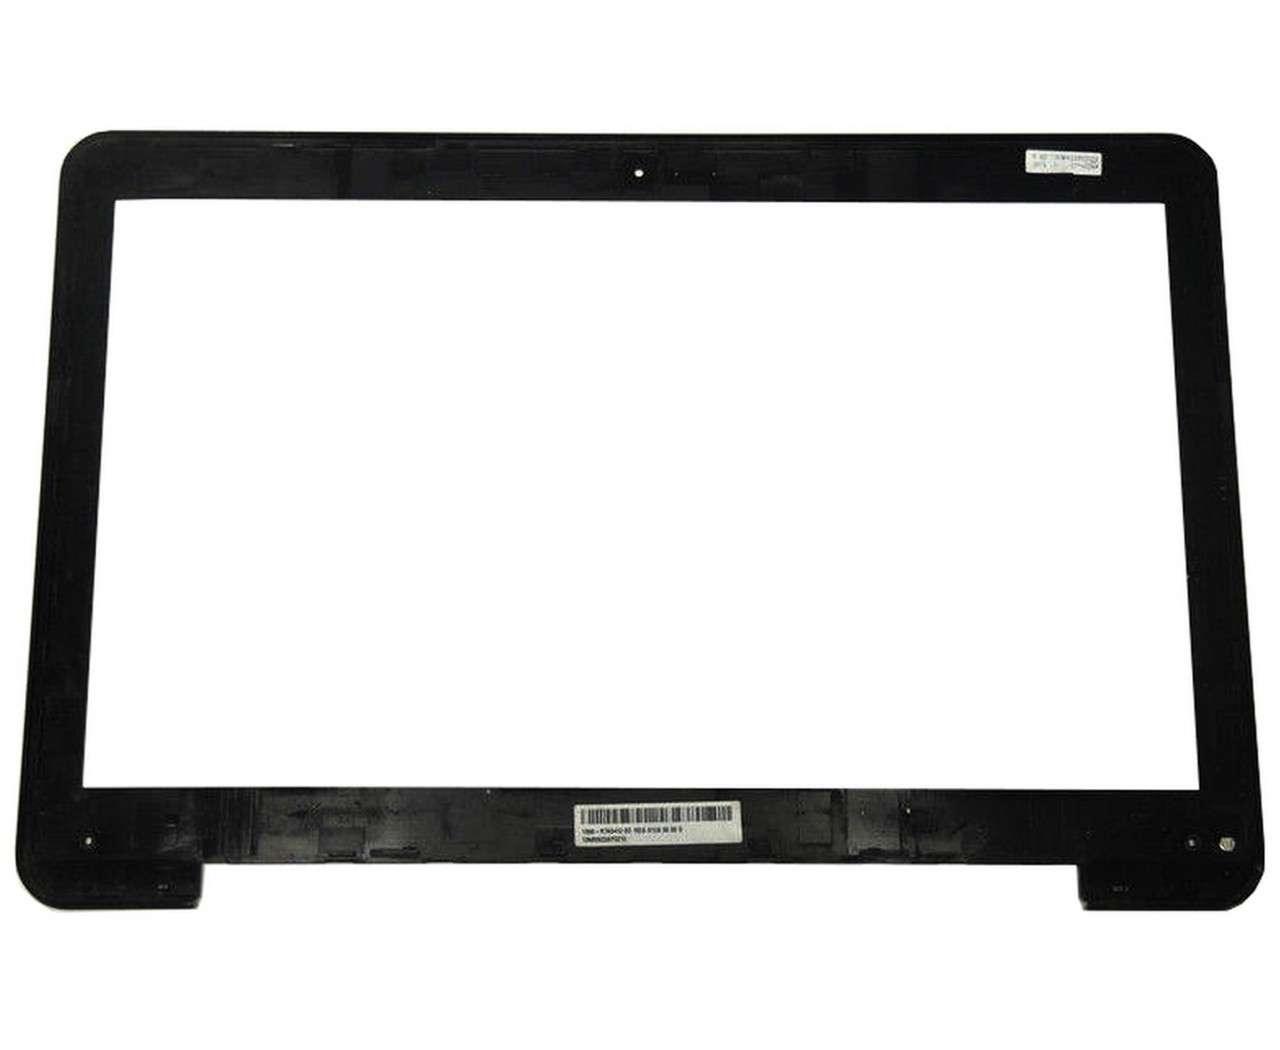 Rama Display Asus R556LD Bezel Front Cover Neagra imagine powerlaptop.ro 2021